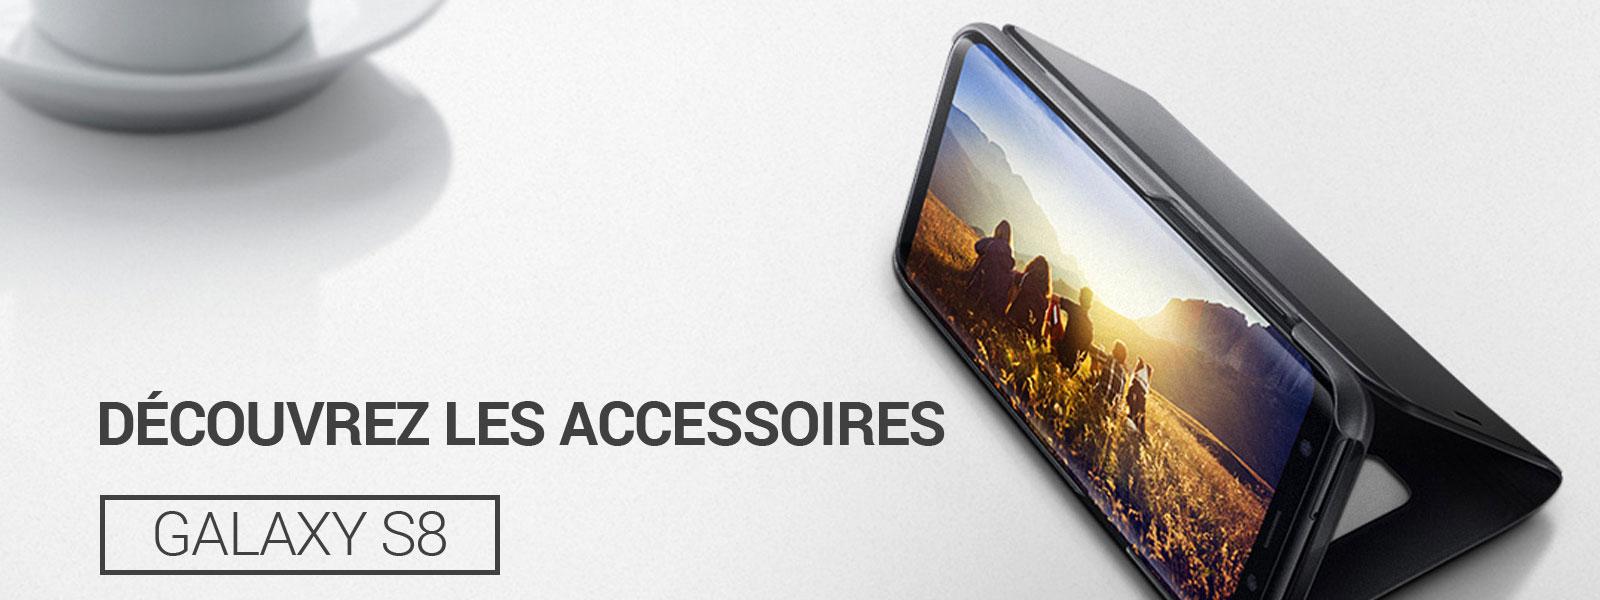 Accessoires Samsung Galaxy S8